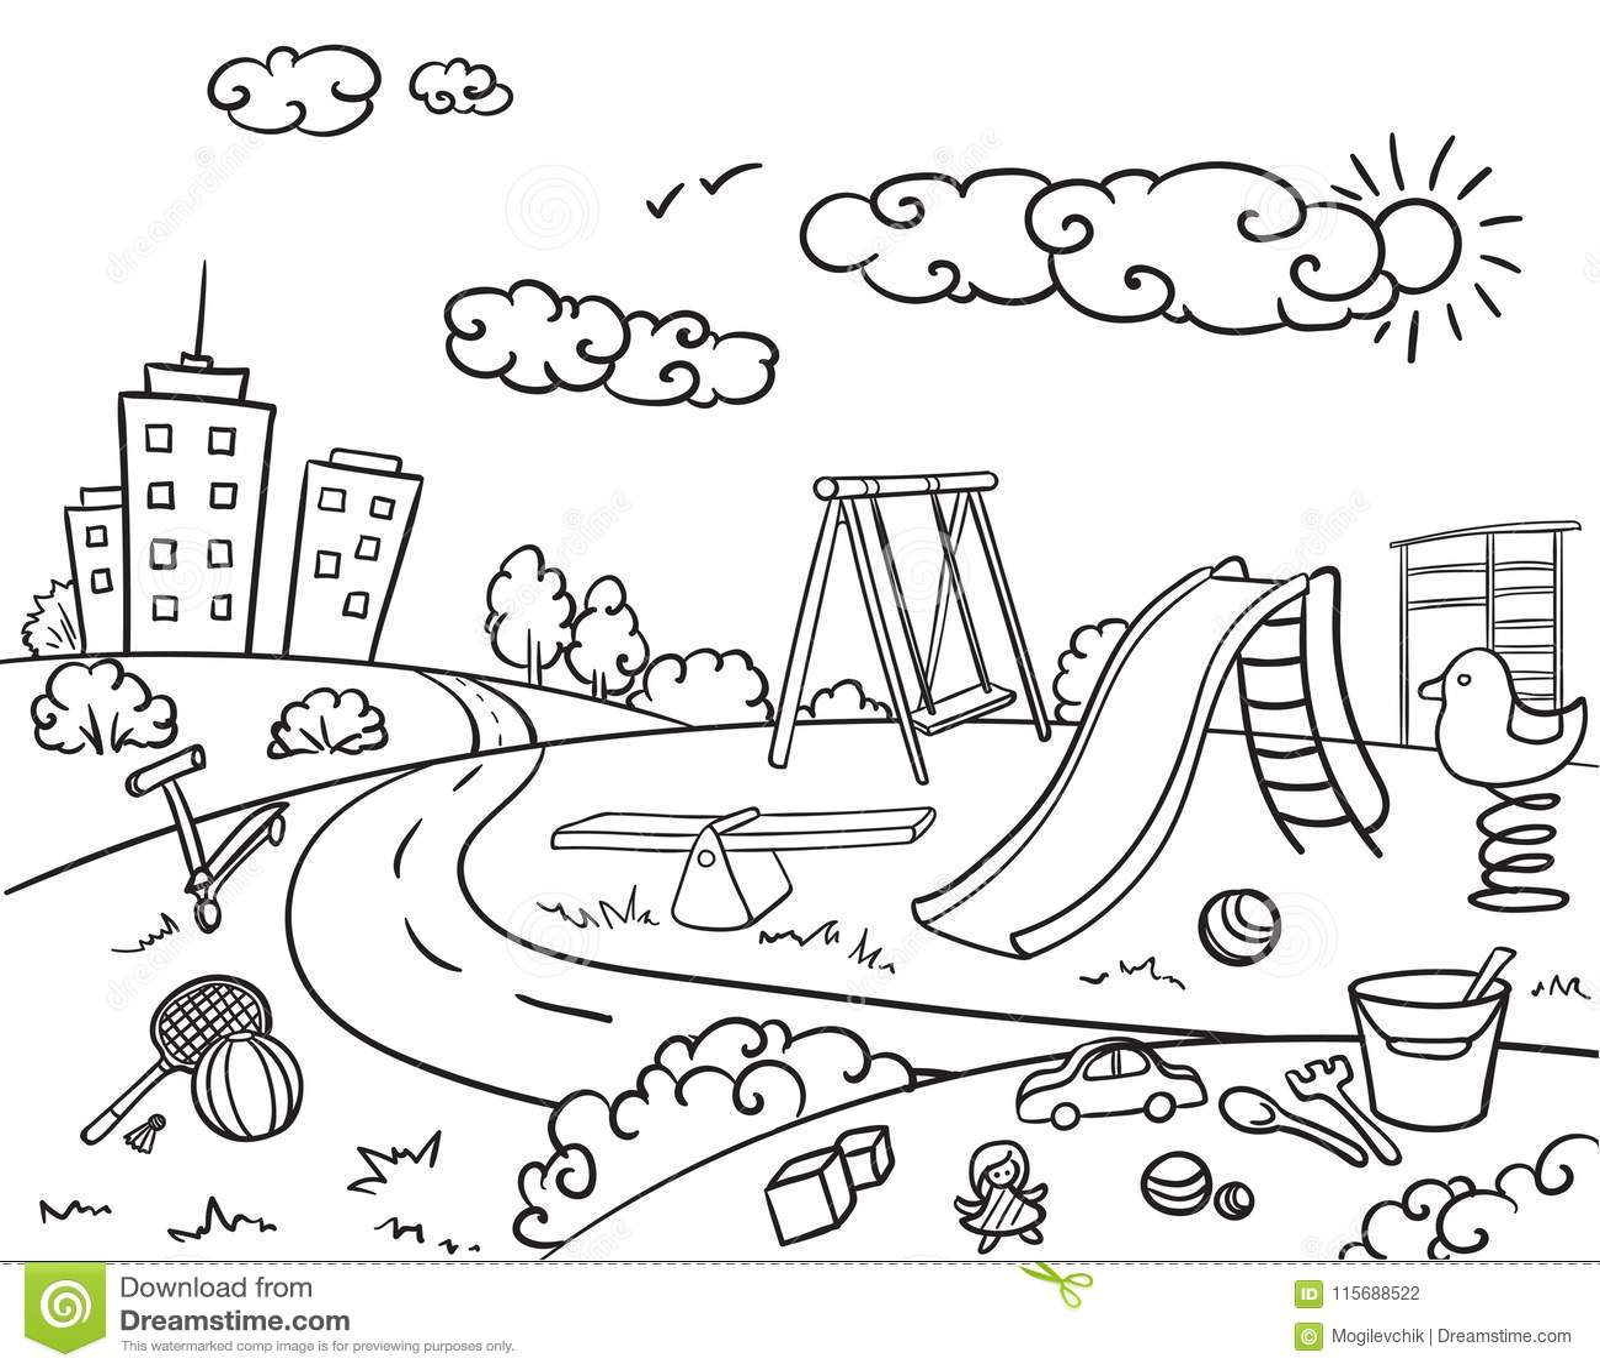 Doodle Monochrome Children Playground Concept Stock Vector